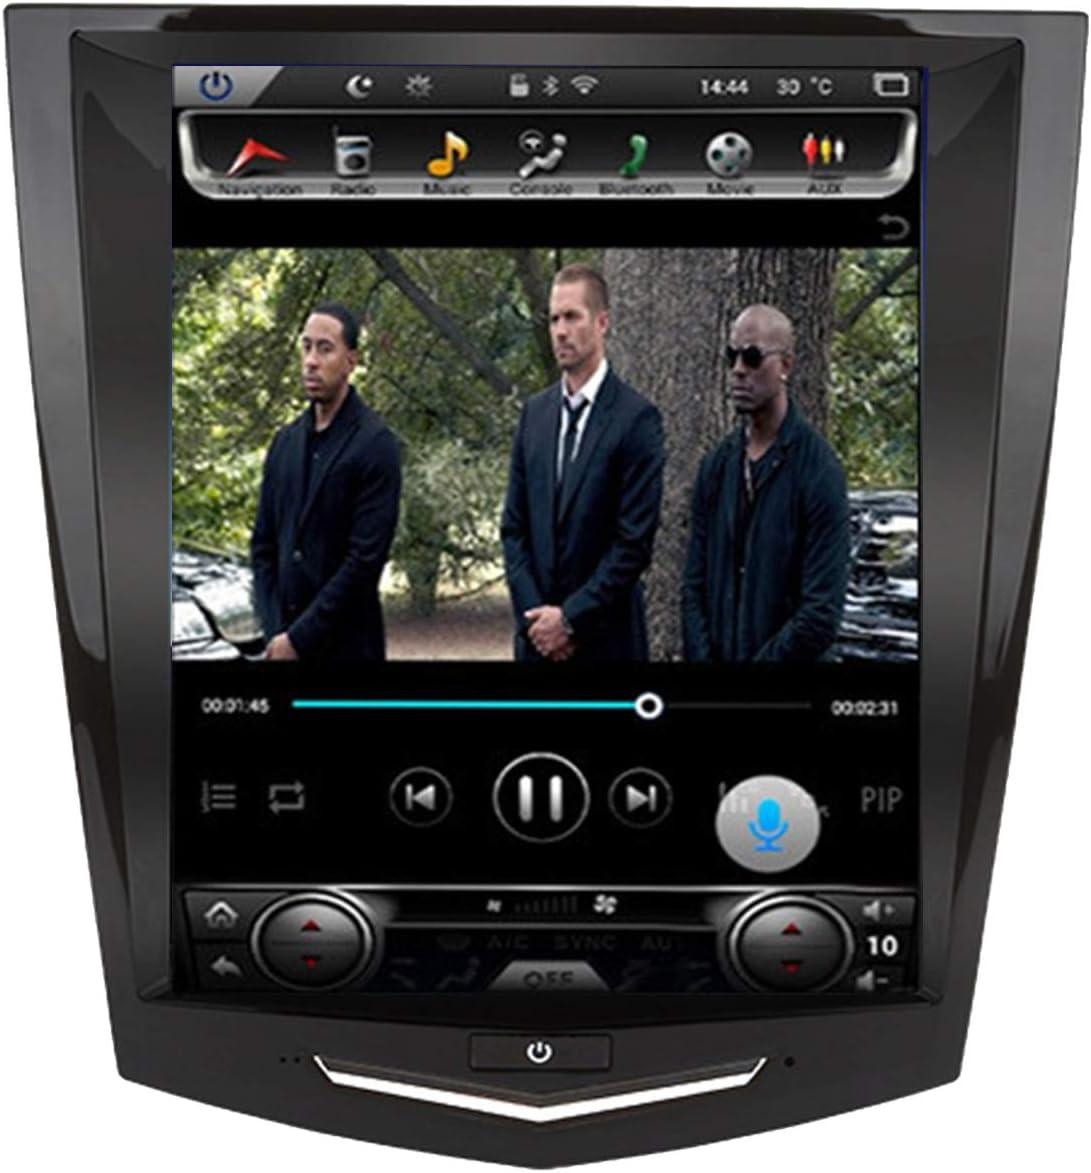 Amazon.com: FLYUNICE 10.4 Inch Tesla Style 4GB RAM Android 9.0 Car Stereo  Radio GPS Navigation for Cadillac XTS 2013 2014 2015 2016 2017 2018 Touch  Screen Head Unit Multimedia Bluetooth WiFi SWC: GPS & Navigation